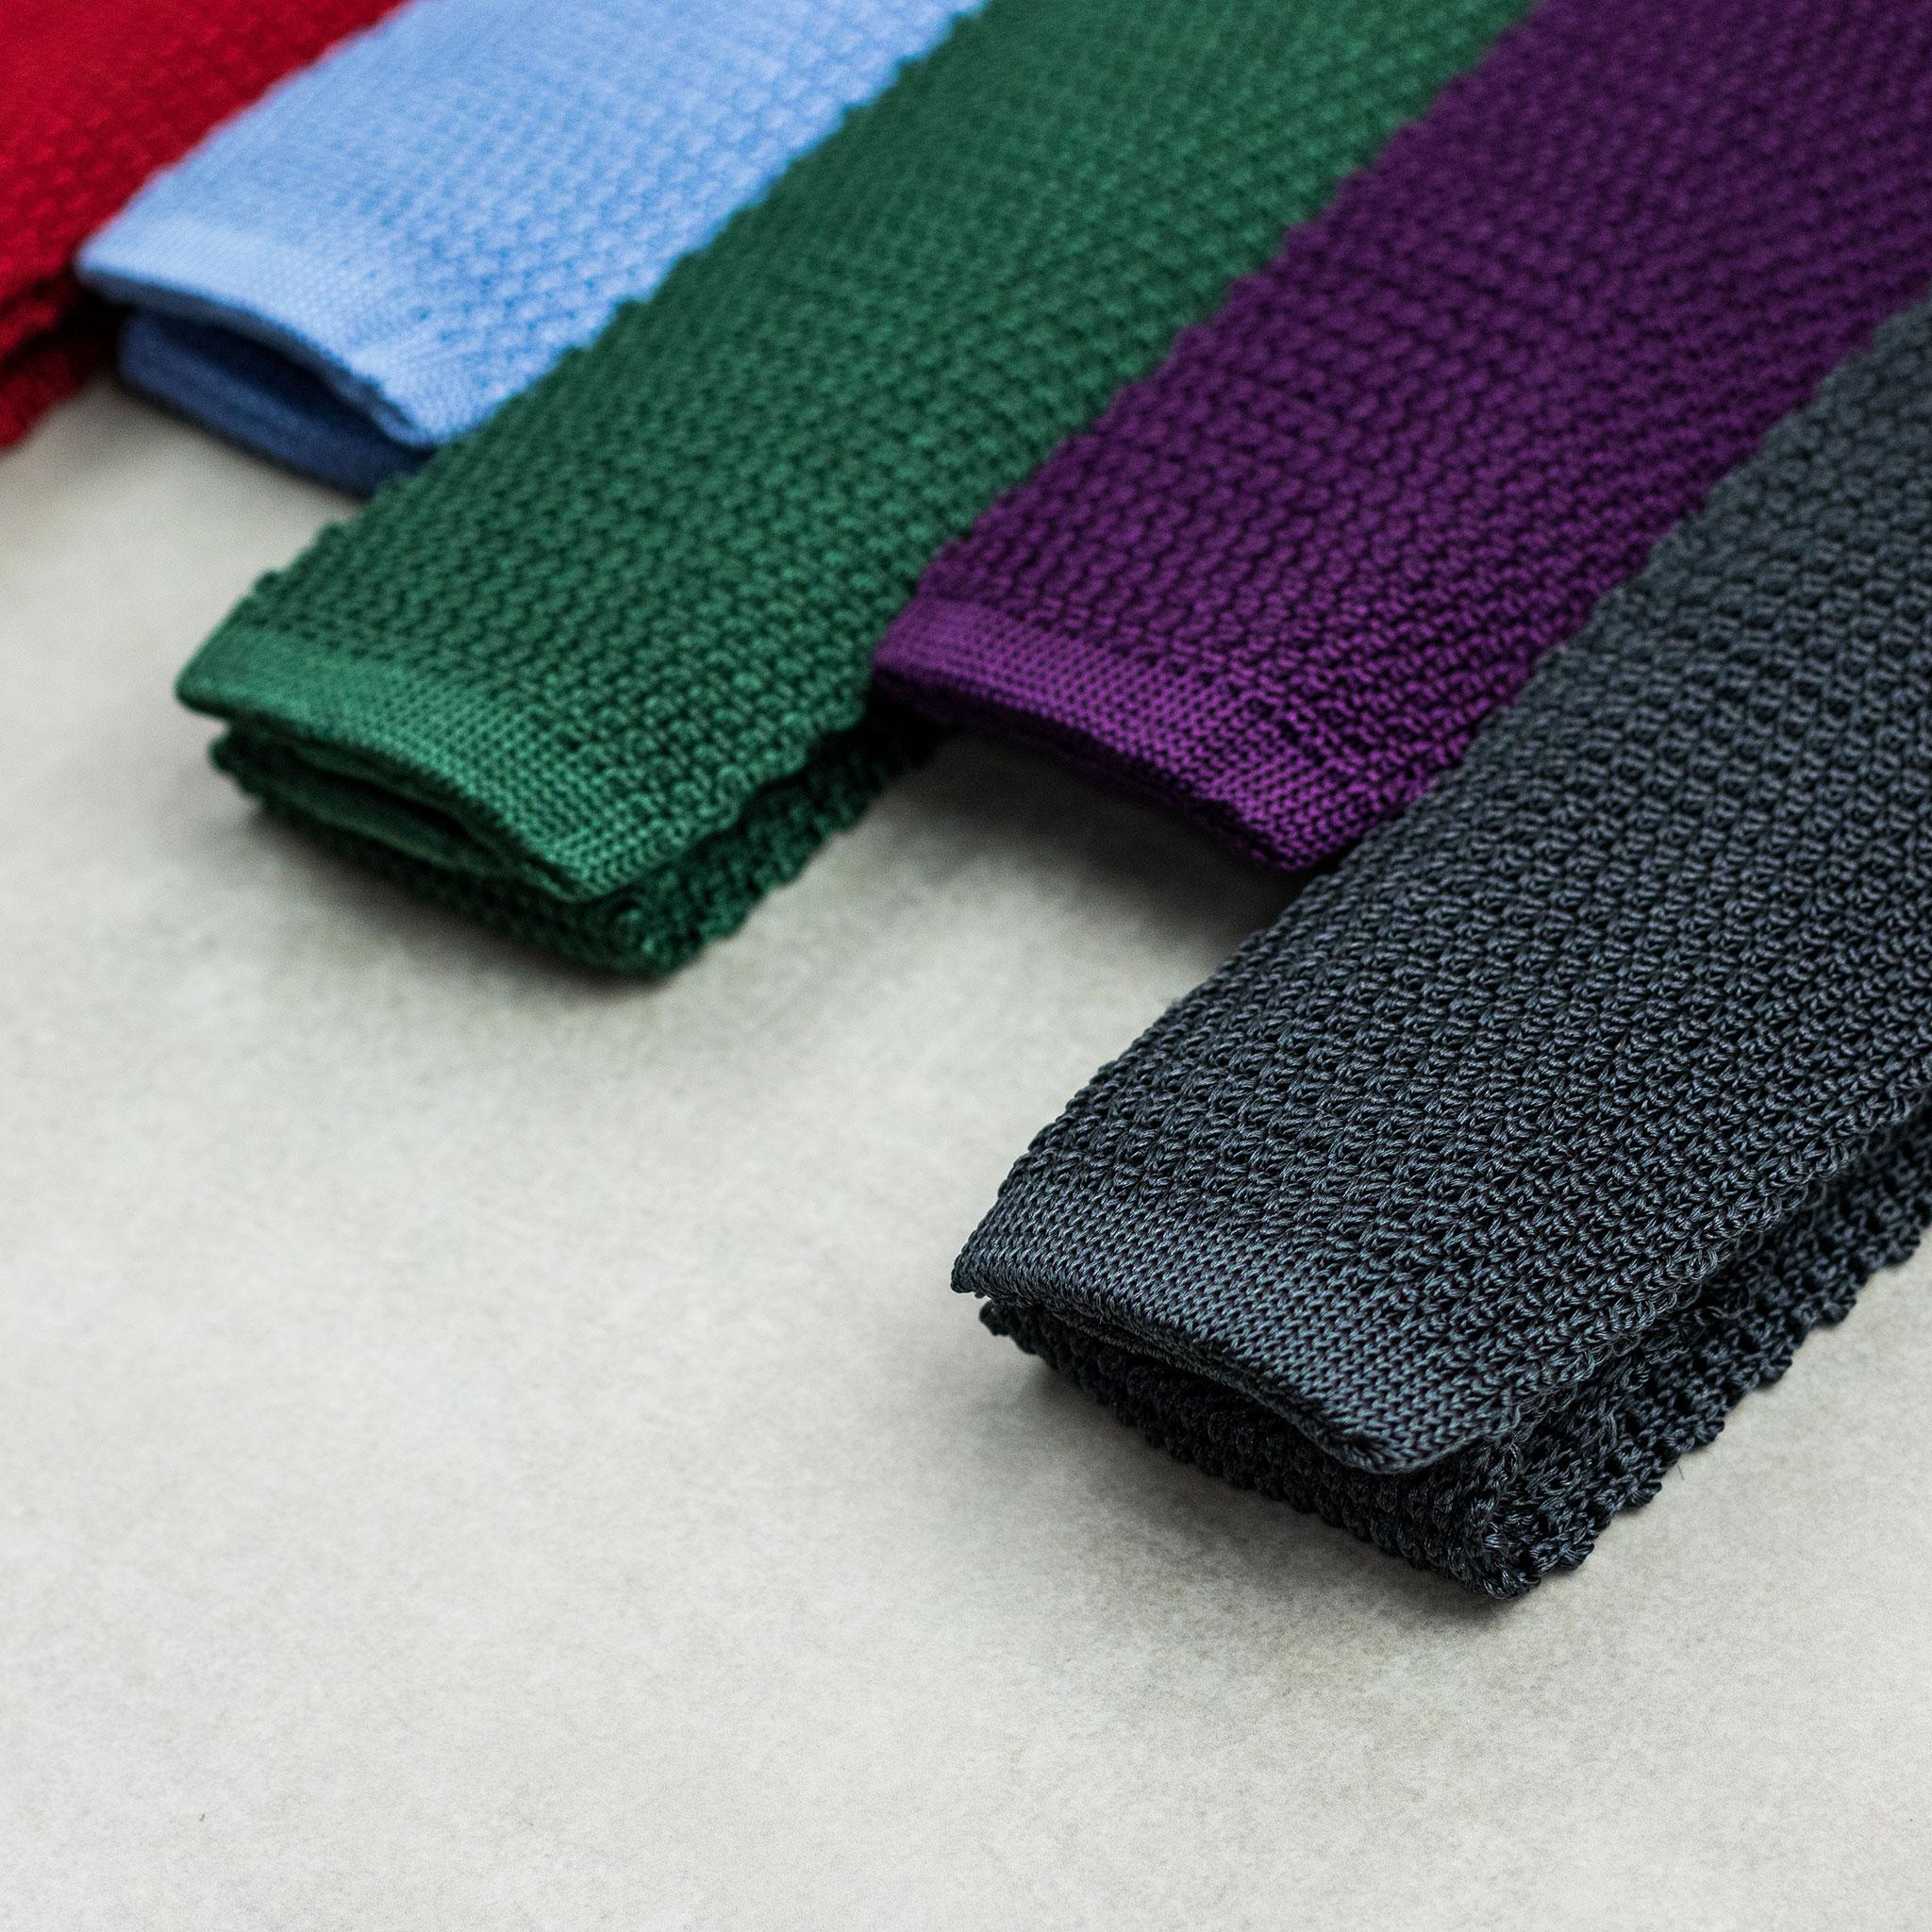 Gravata de tricot